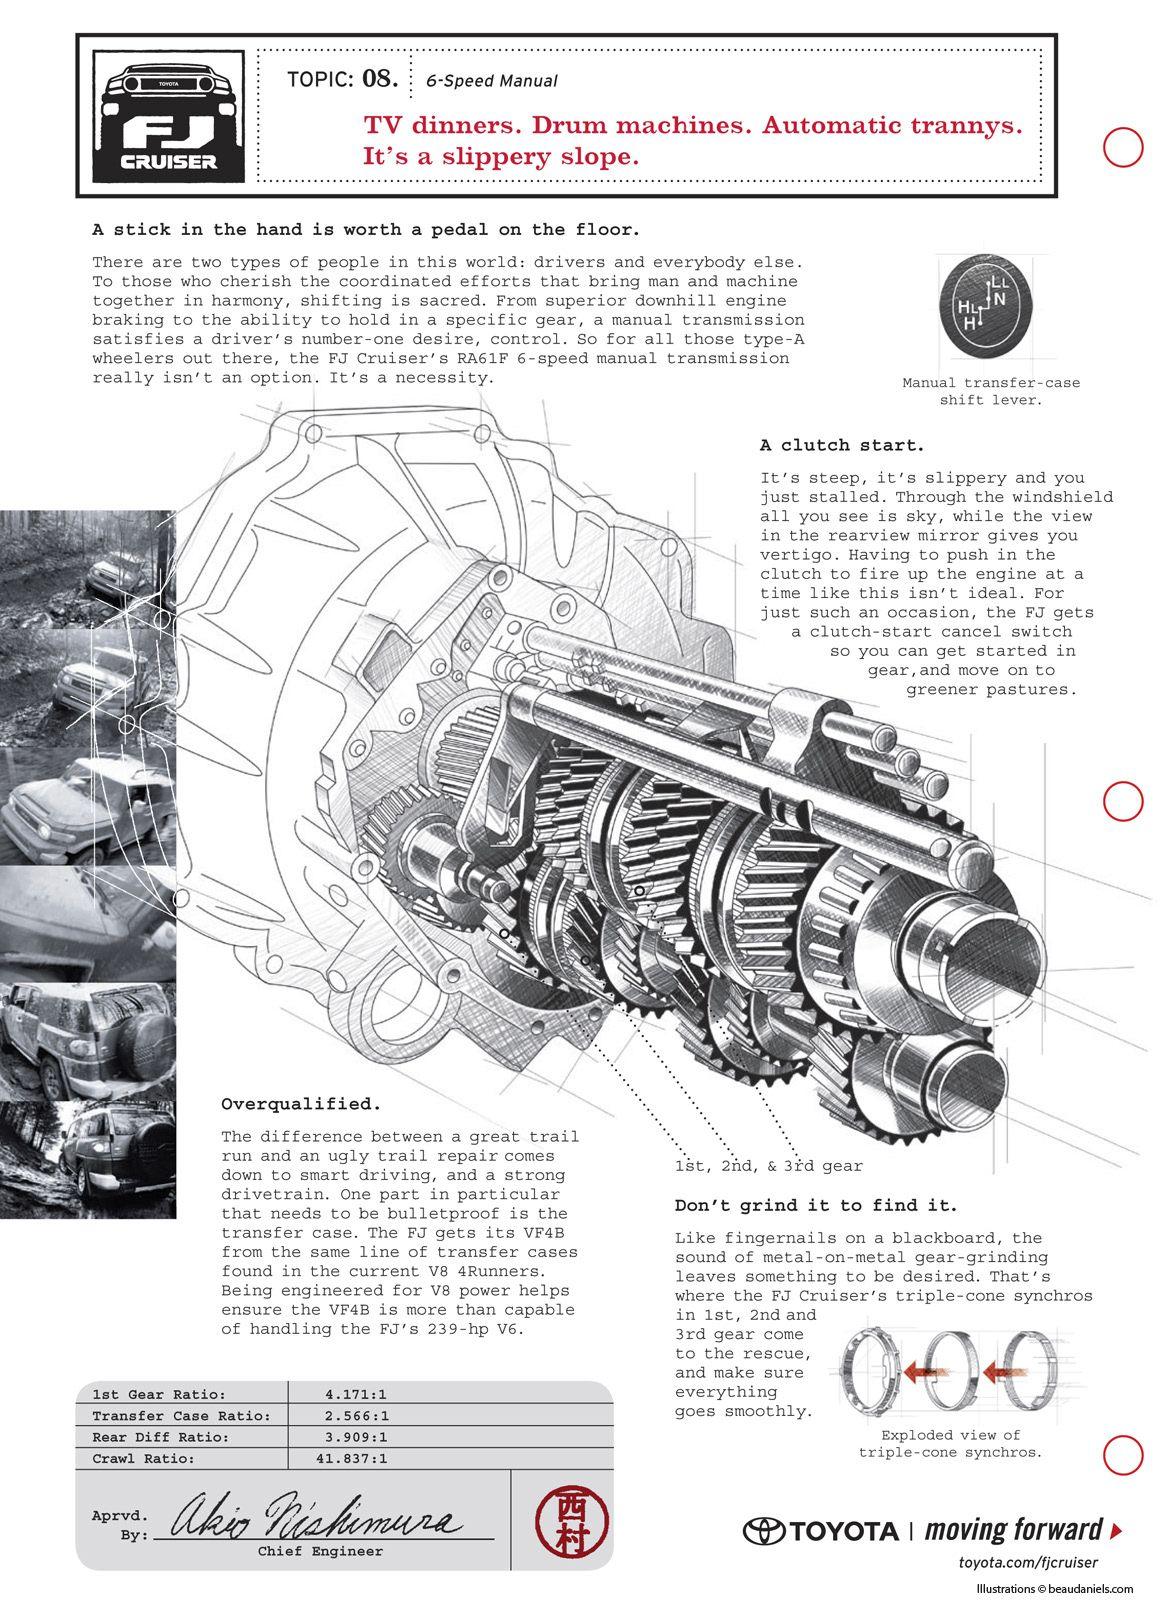 Fj Cruiser Ads Cutaway Style Technical Illustration Of A